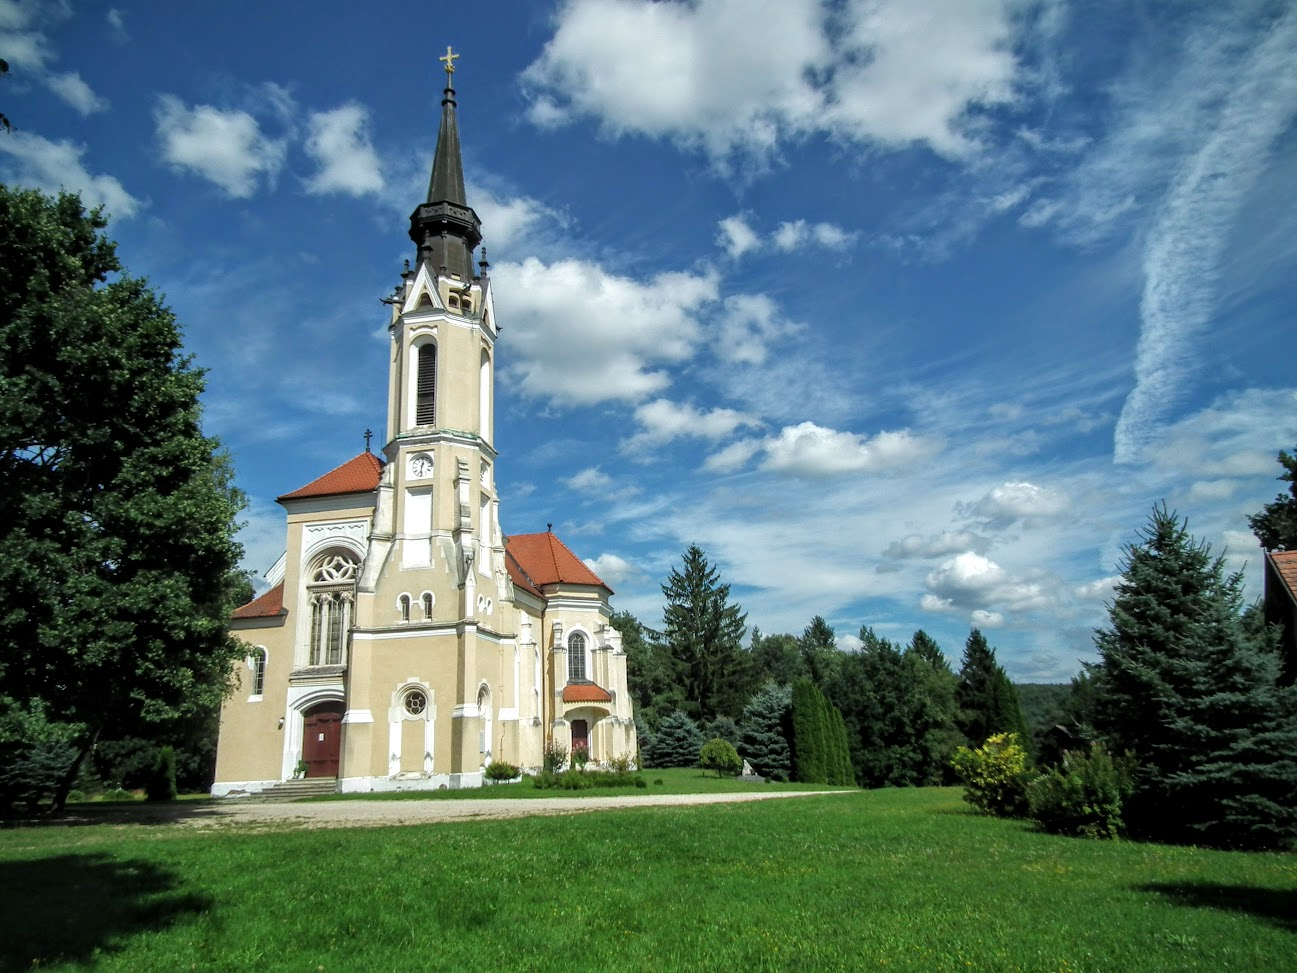 Rönöki Szent Imre Templom